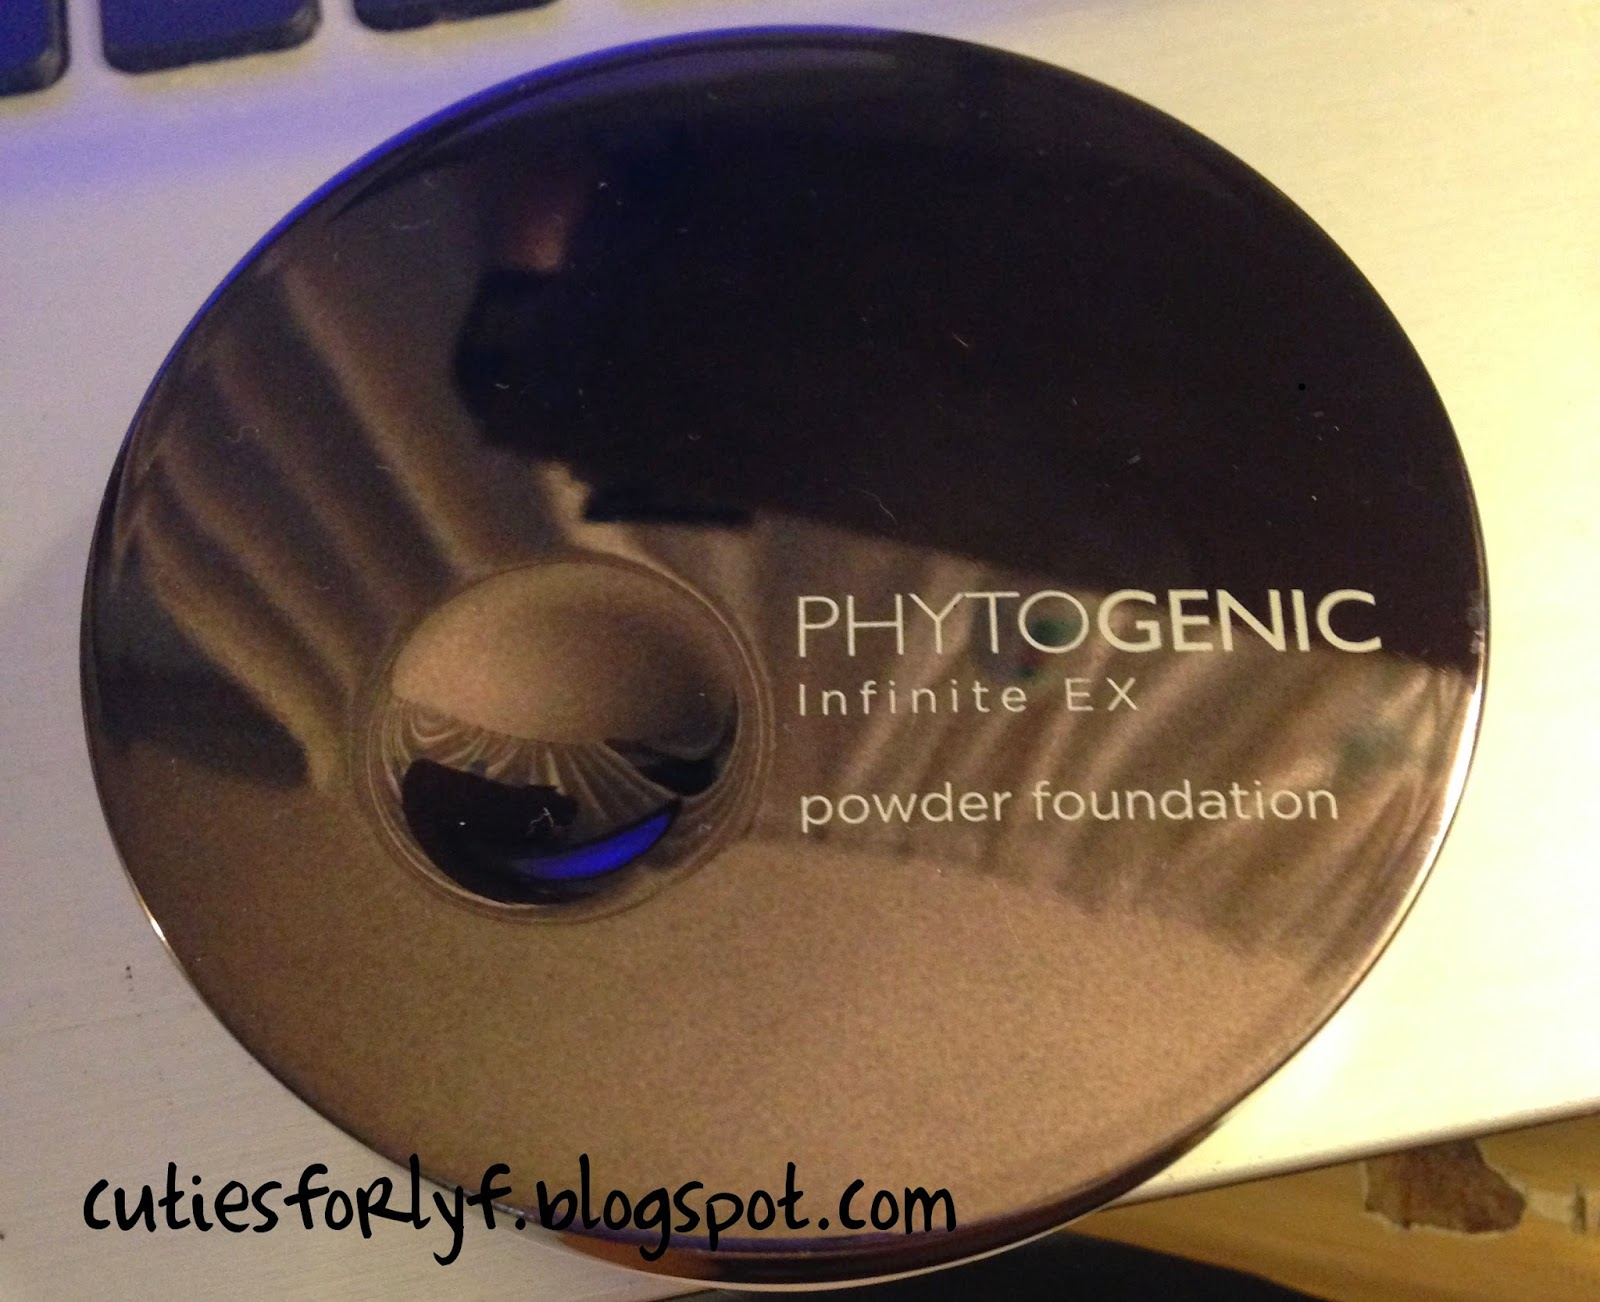 ] The Face Shop Phytogenic Infinite EX Powder Foundation (Renewal #BCB00F